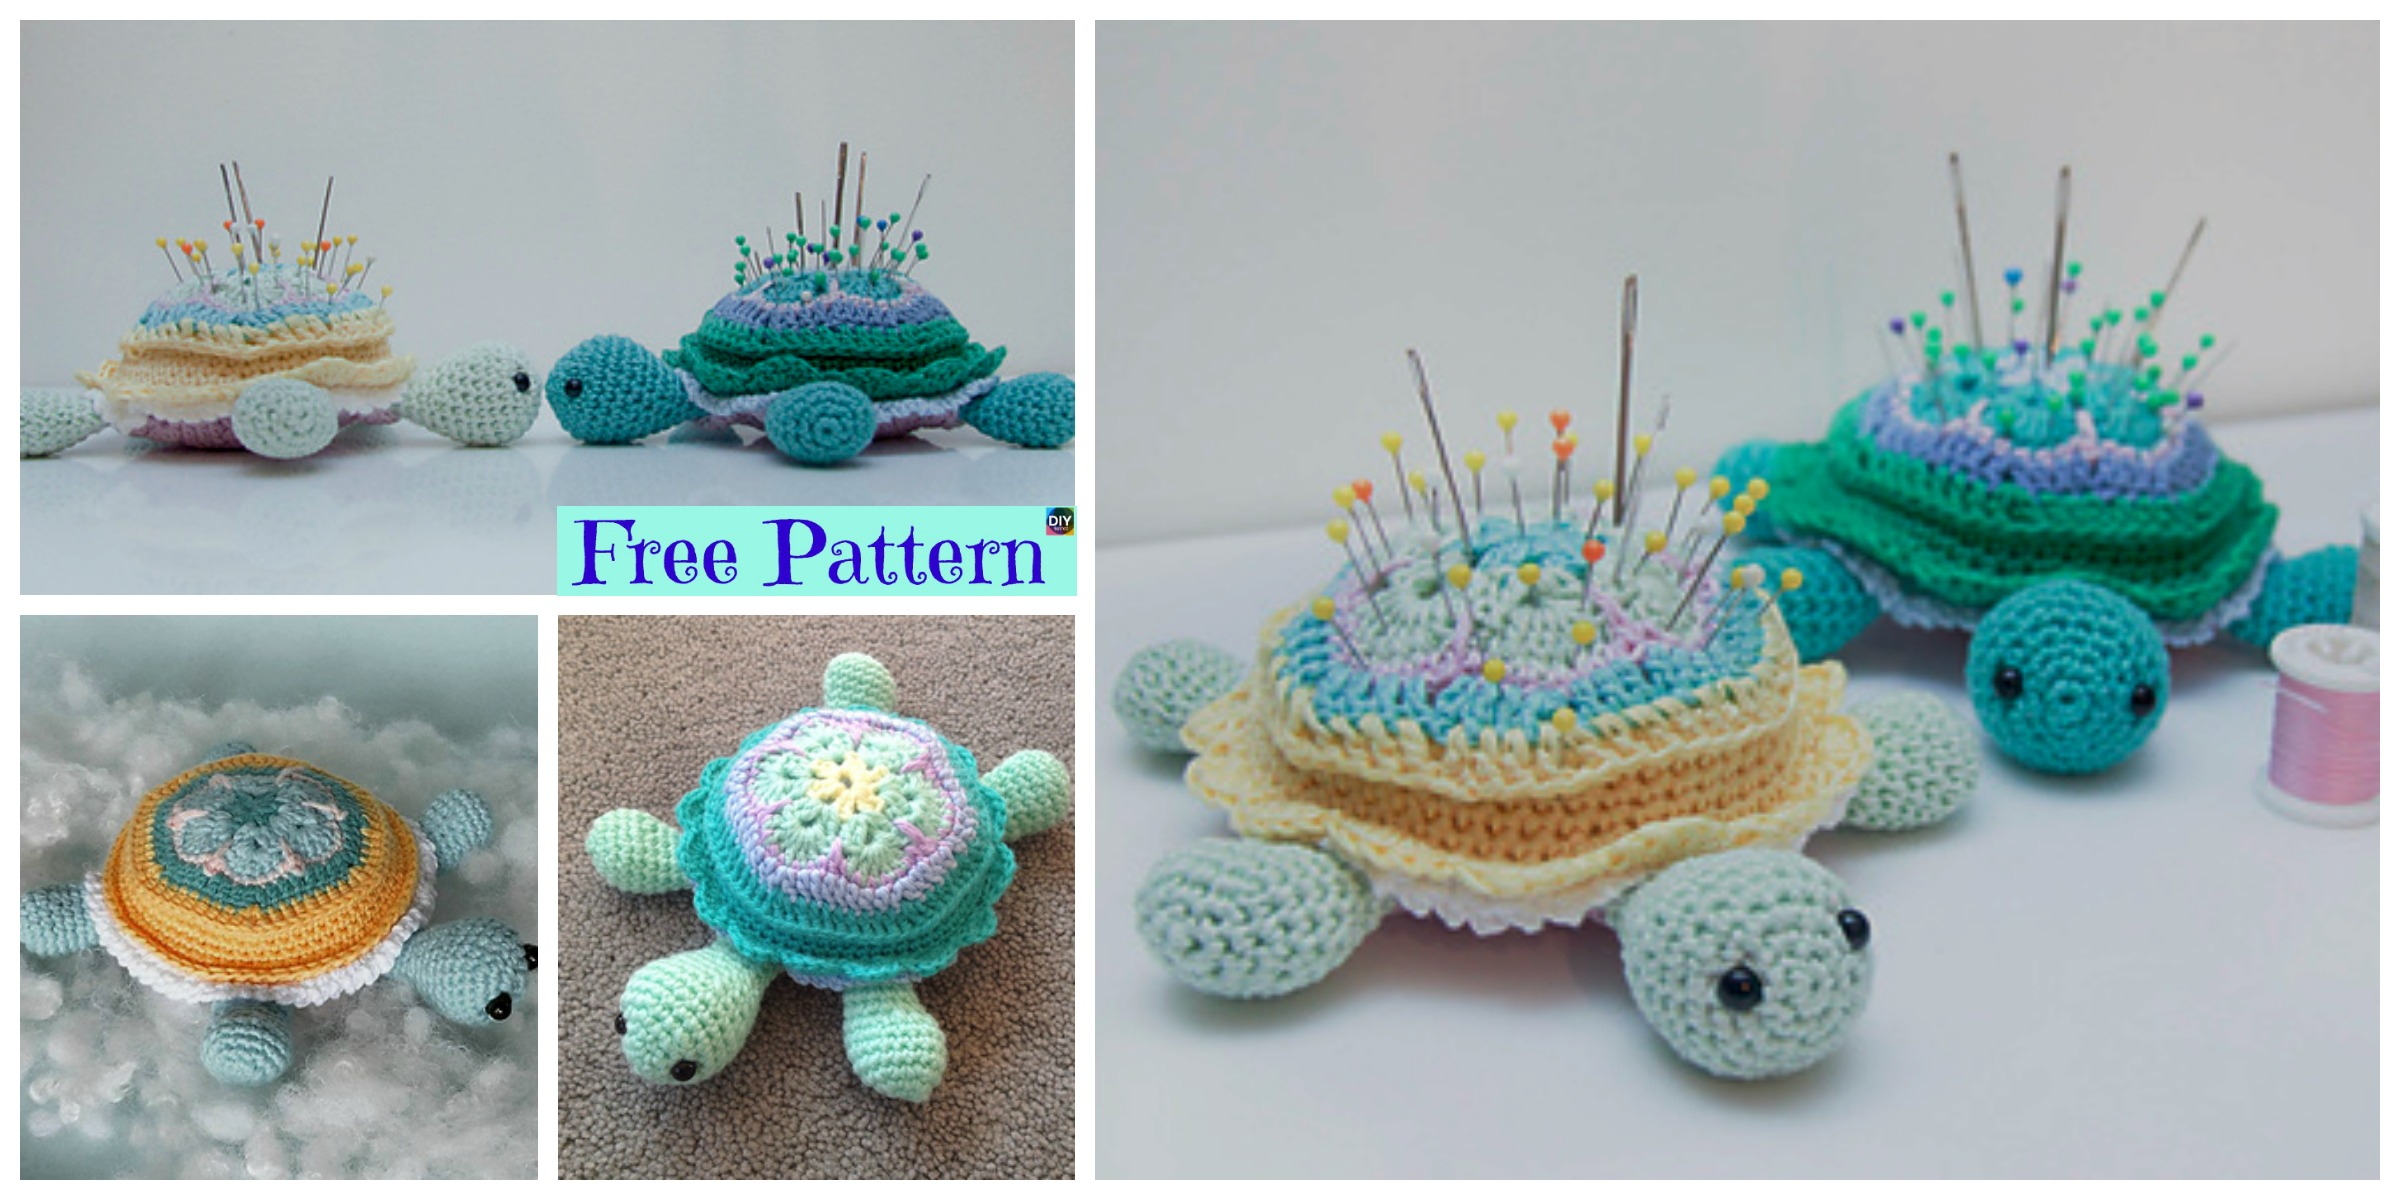 Cute Crochet Turtle Pincushion – Free Pattern